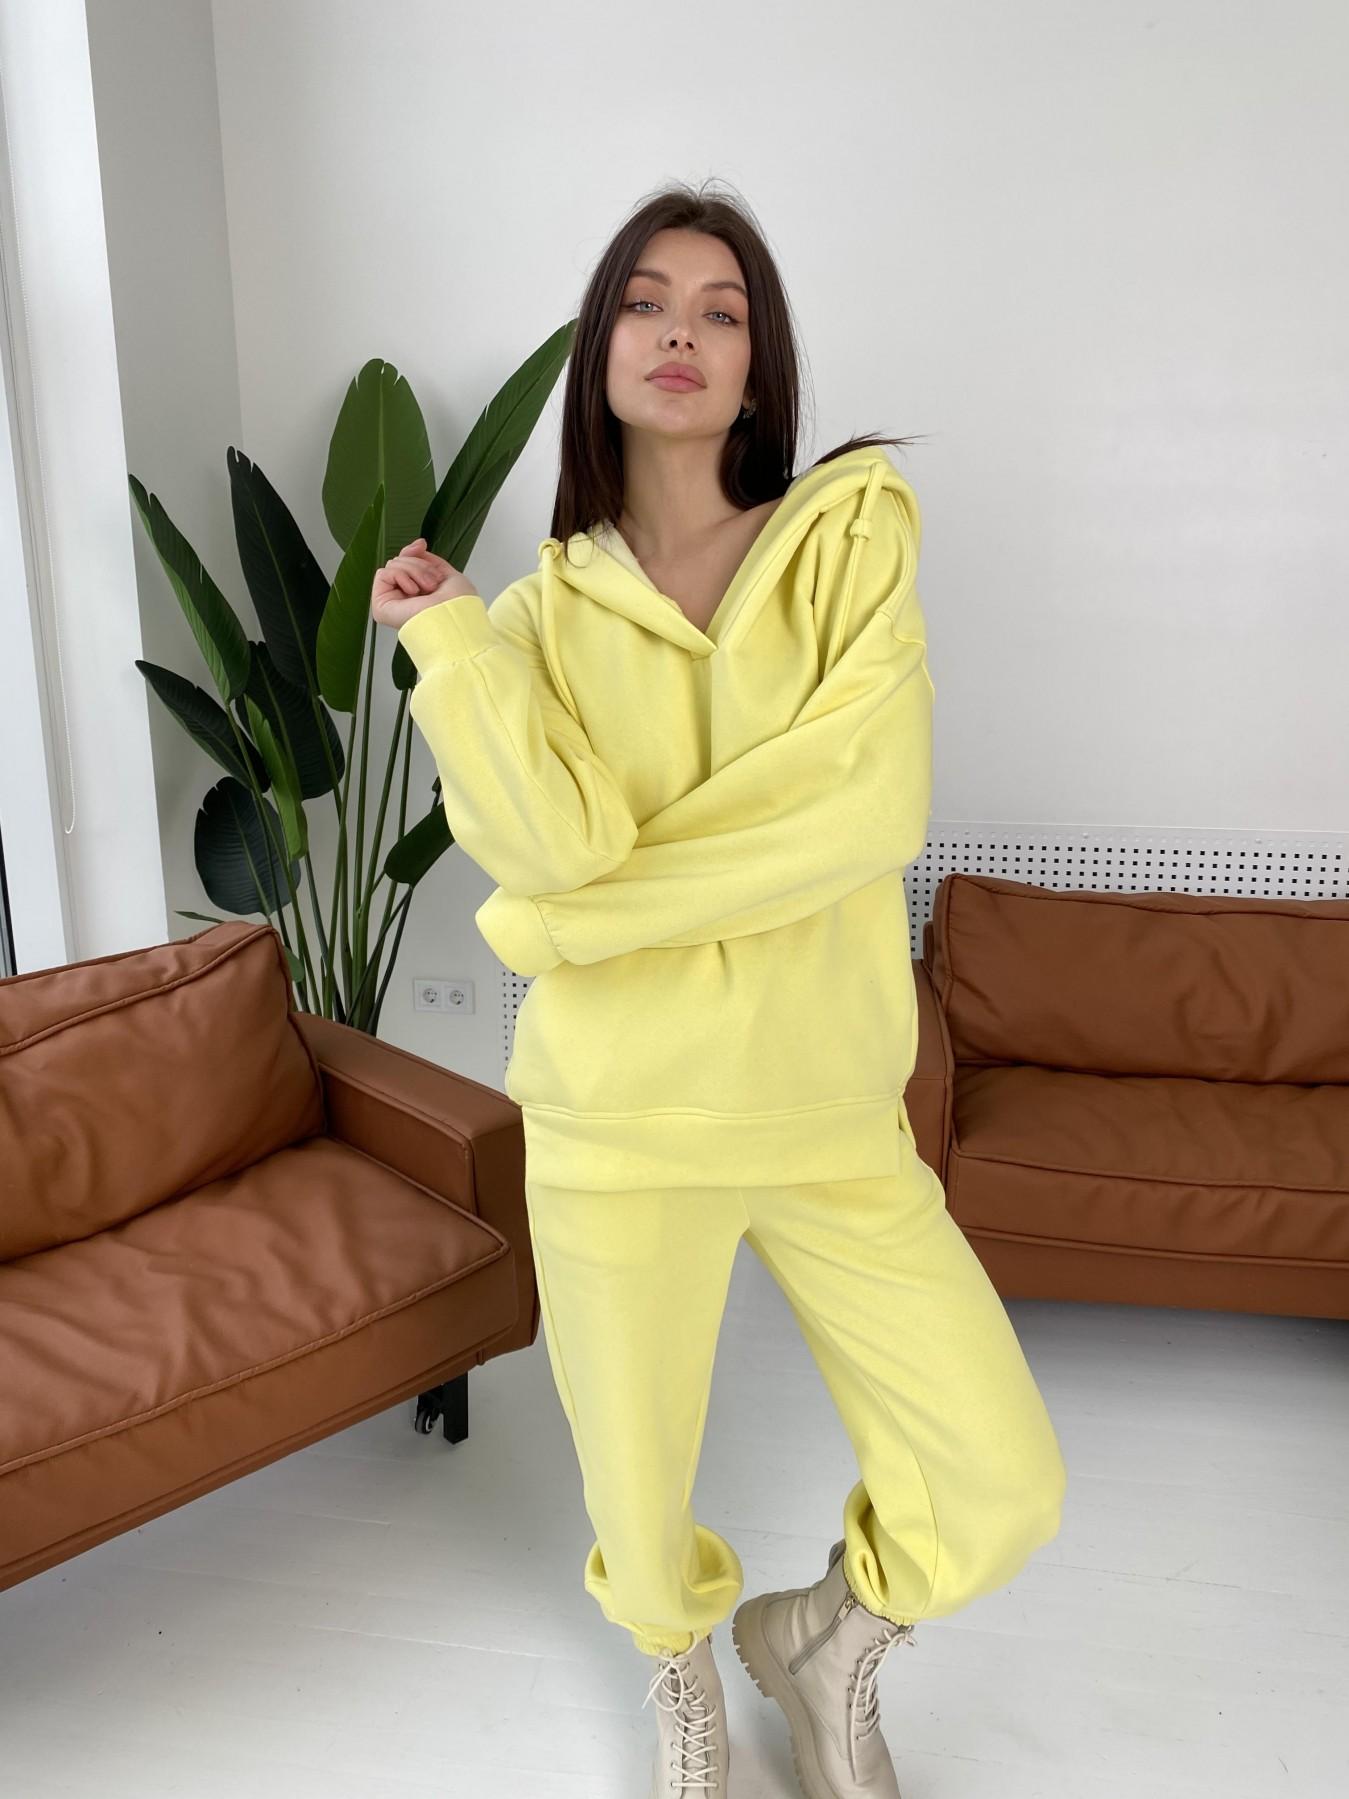 Ярис костюм из 3х нитки 10789 АРТ. 47259 Цвет: Лимон - фото 4, интернет магазин tm-modus.ru